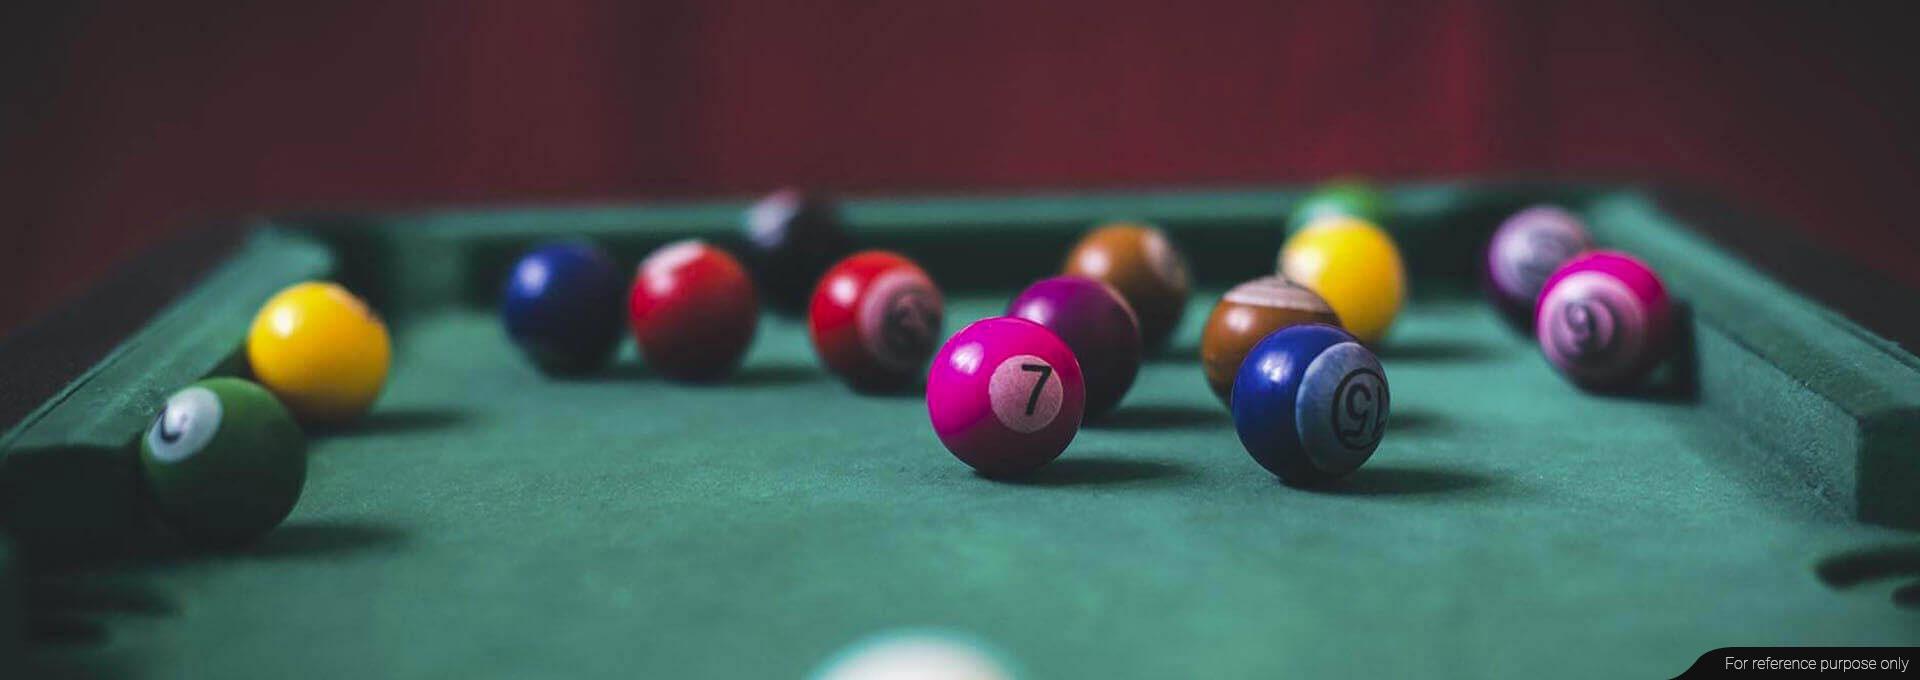 glen gate hebbal billiards